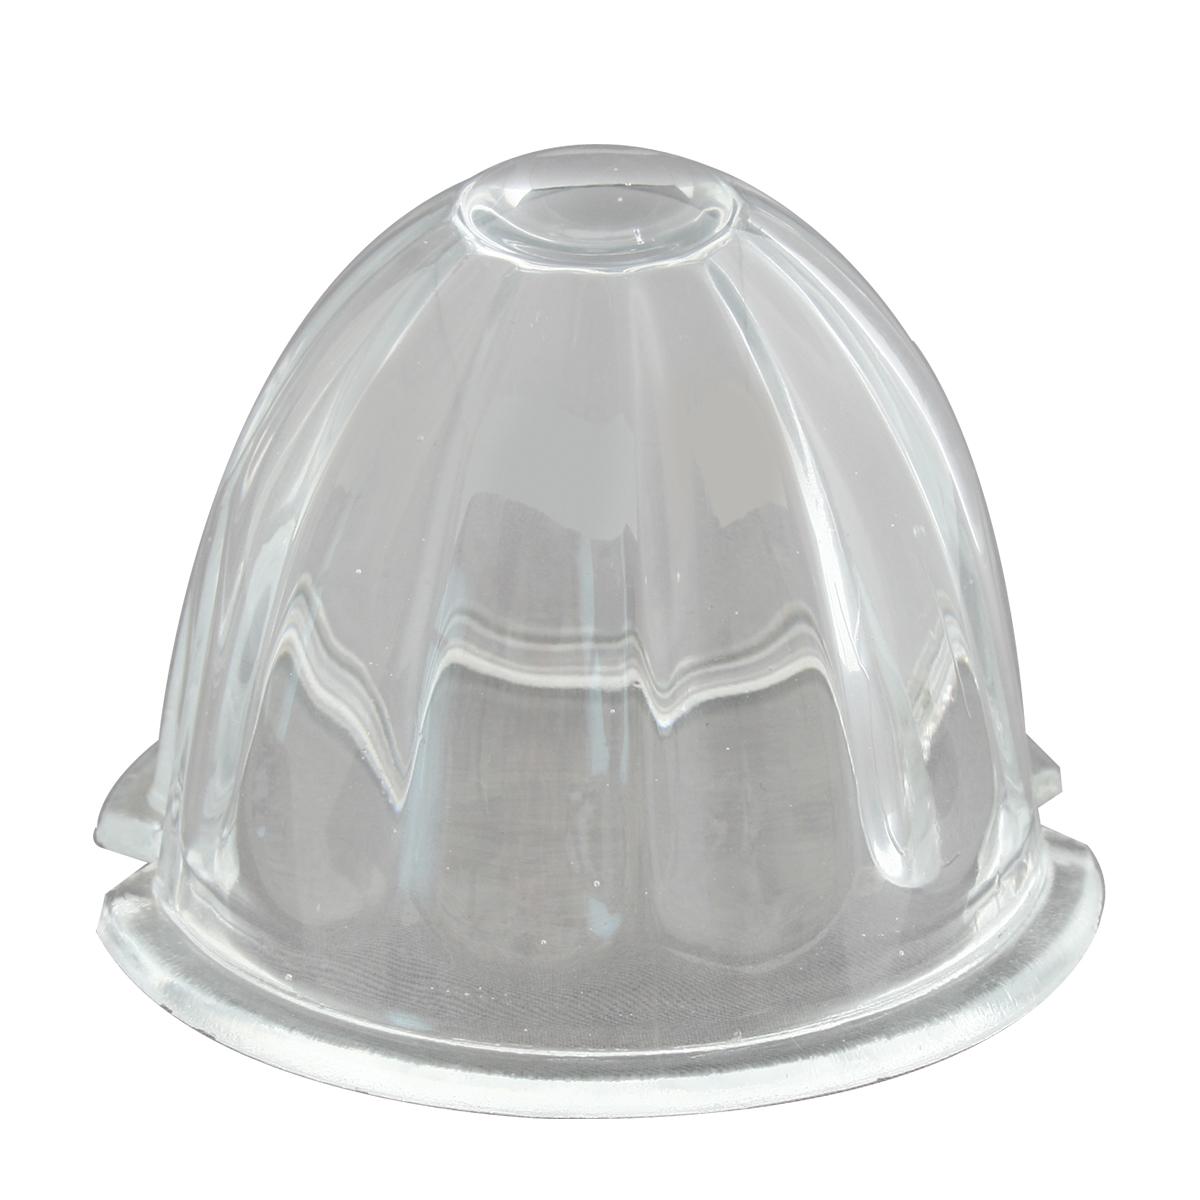 Marker Light GG Grand General 80459 Clear Plastic Lens for Rect